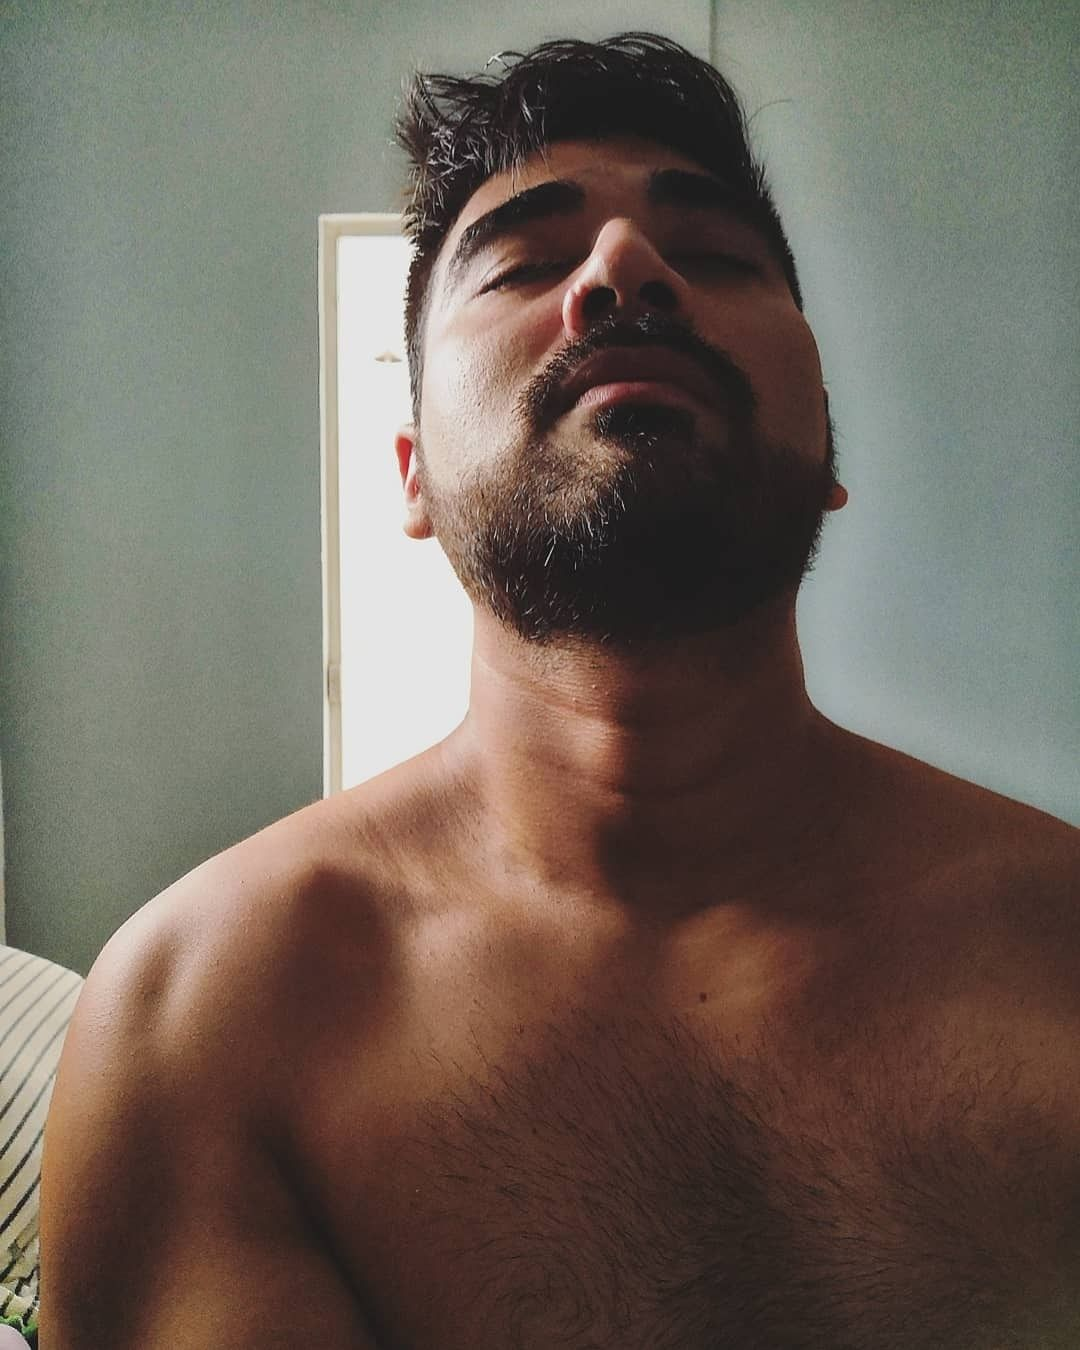 #sunday #sundaymorning #beard #beardman #instapic #instalike #instamoment #goodmorningworld